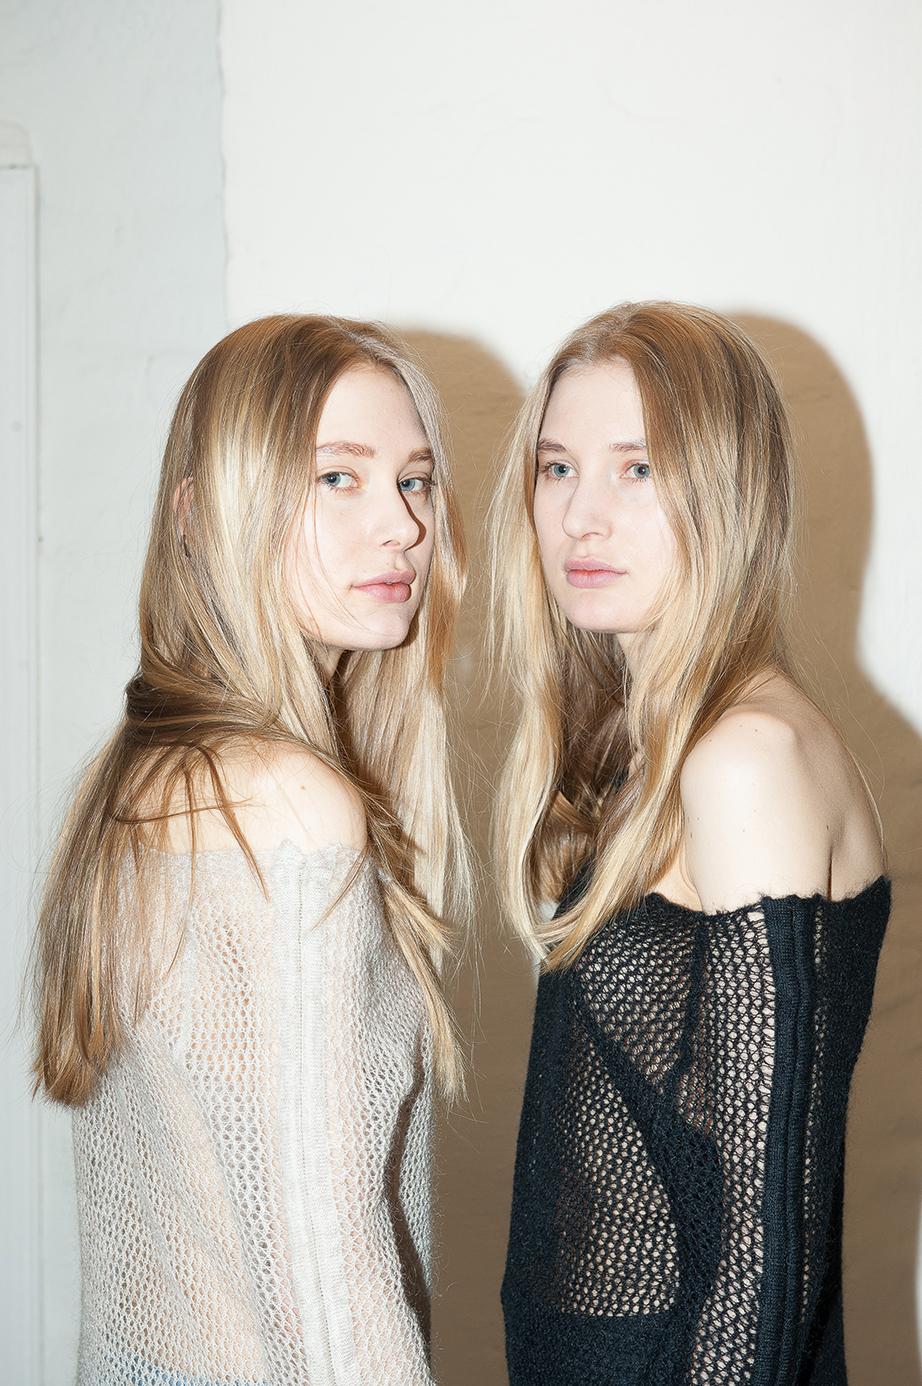 Modellene Nora og Mari Eldjarn Borgersen i Mardou & Dean Foto: Solveig Knutsen / Palookaville